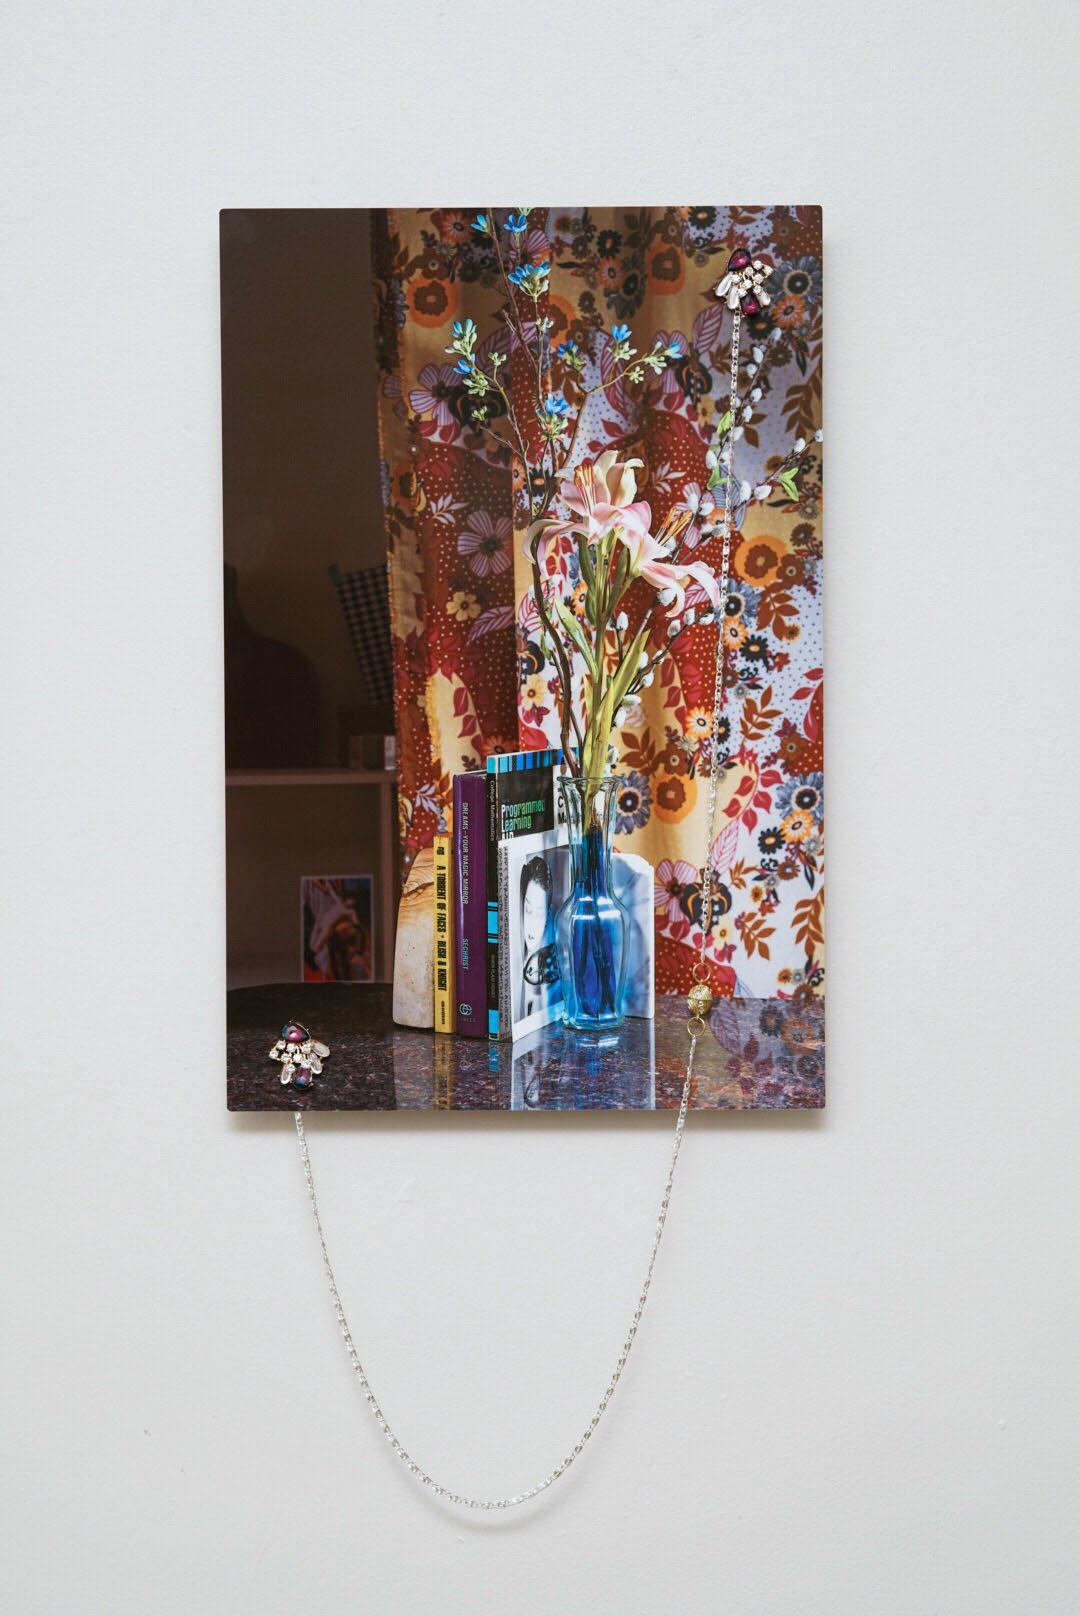 Nando Alvarez Perez,  Man Ray Jesus Juvenilia,  2019.  Available at our Online Auction. UV print on aluminum, jewelry. 12 x 20 x 2 inches